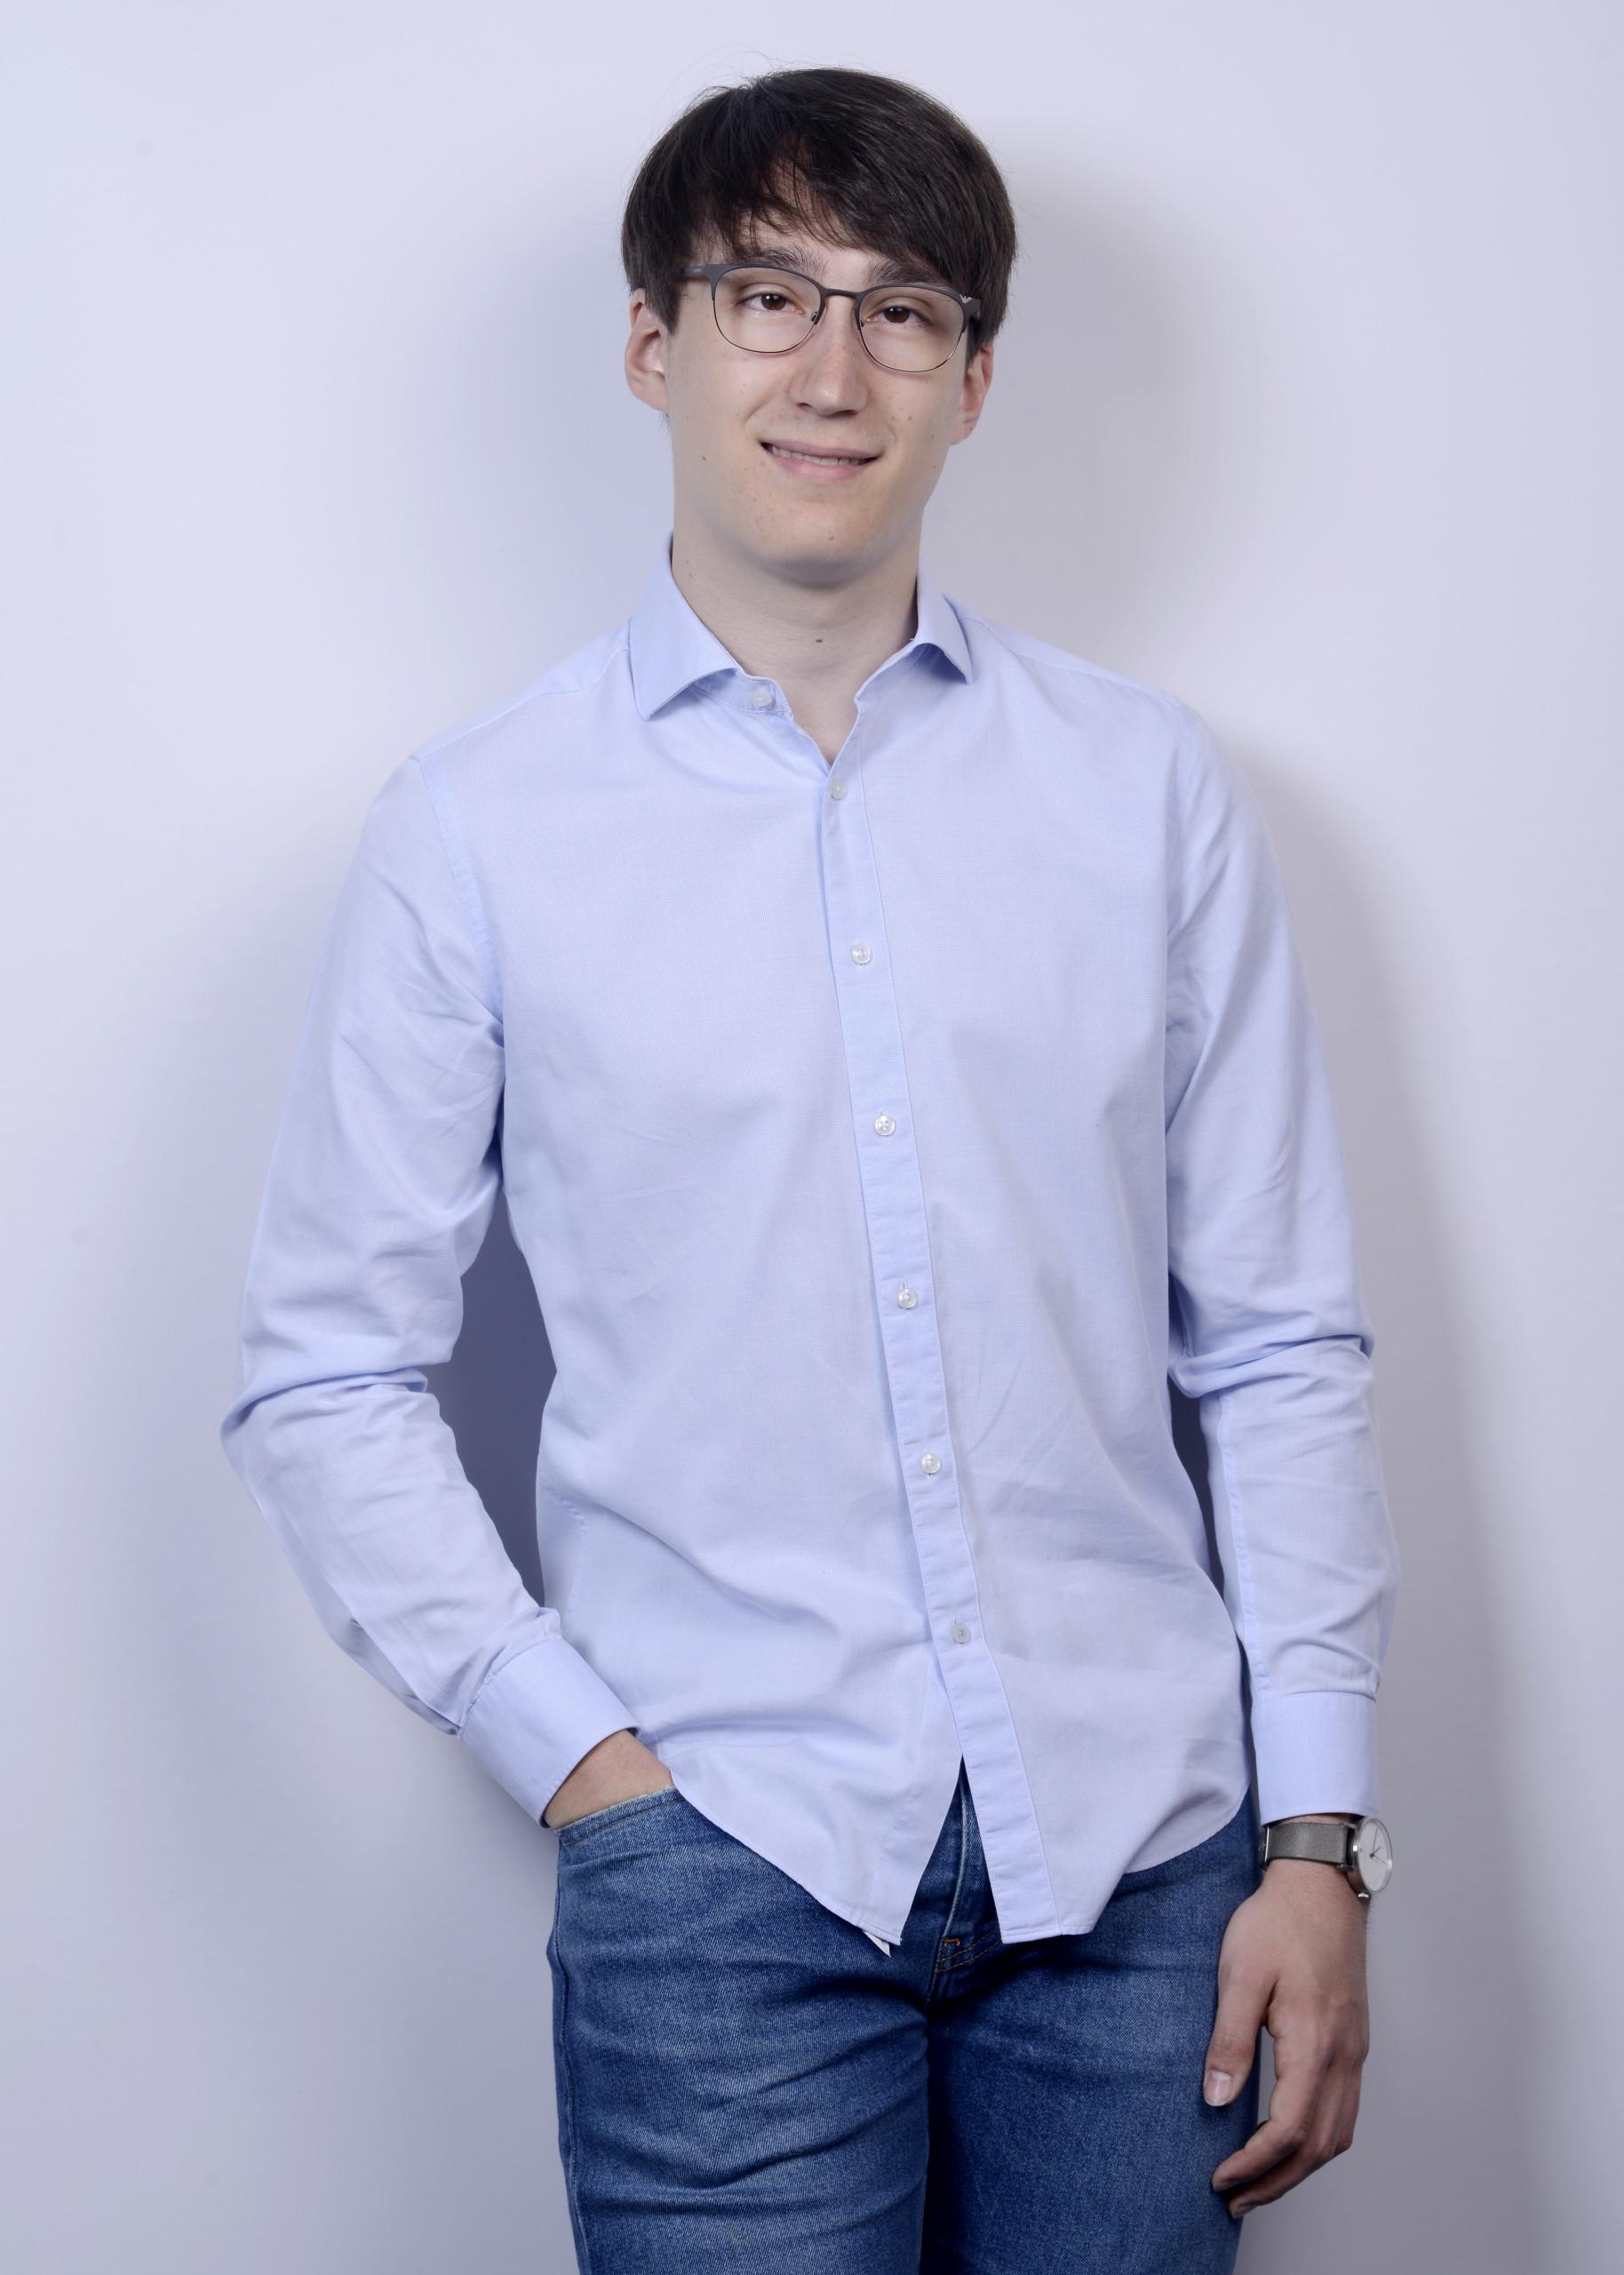 Team: Bastian Schmid